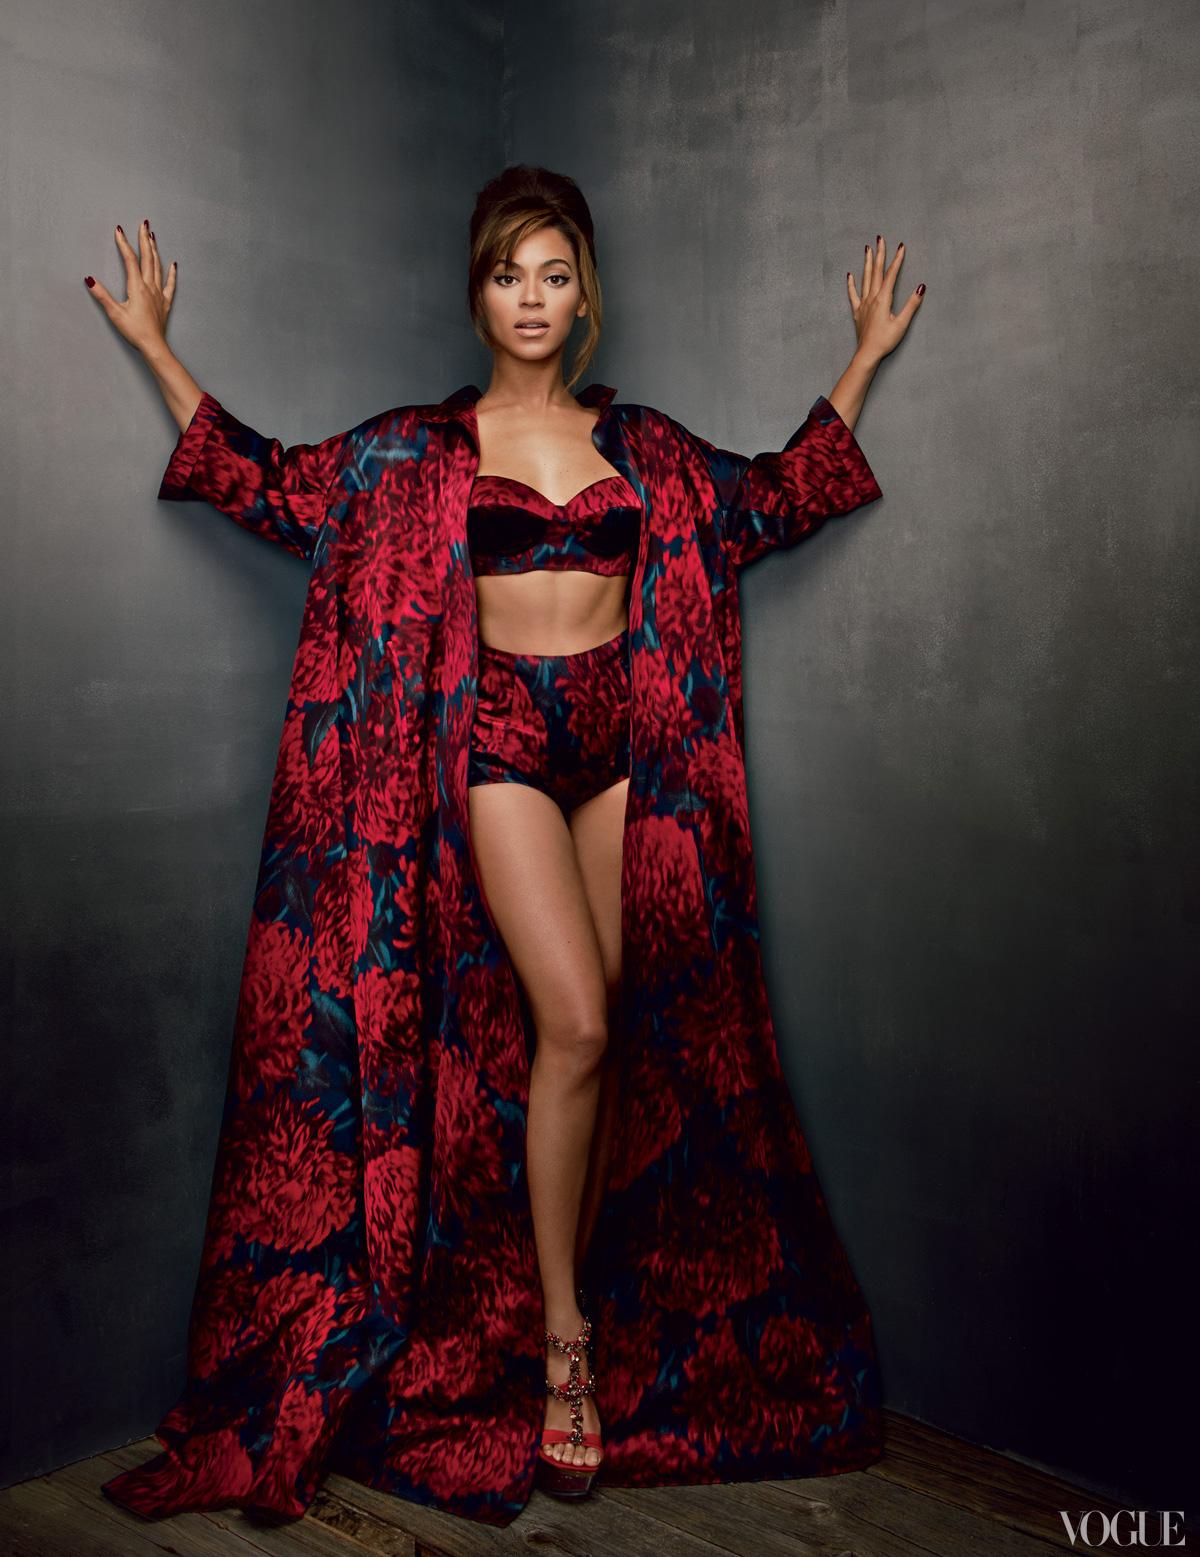 http://1.bp.blogspot.com/-fxP9-c_9IKc/URjvnVyVyDI/AAAAAAABEdk/ubWtJr0K2lg/s1600/Vogue-Magazine-March-2013-Beyonce-Feature-Story-The-Gossip-Wrap-Up-2.jpg